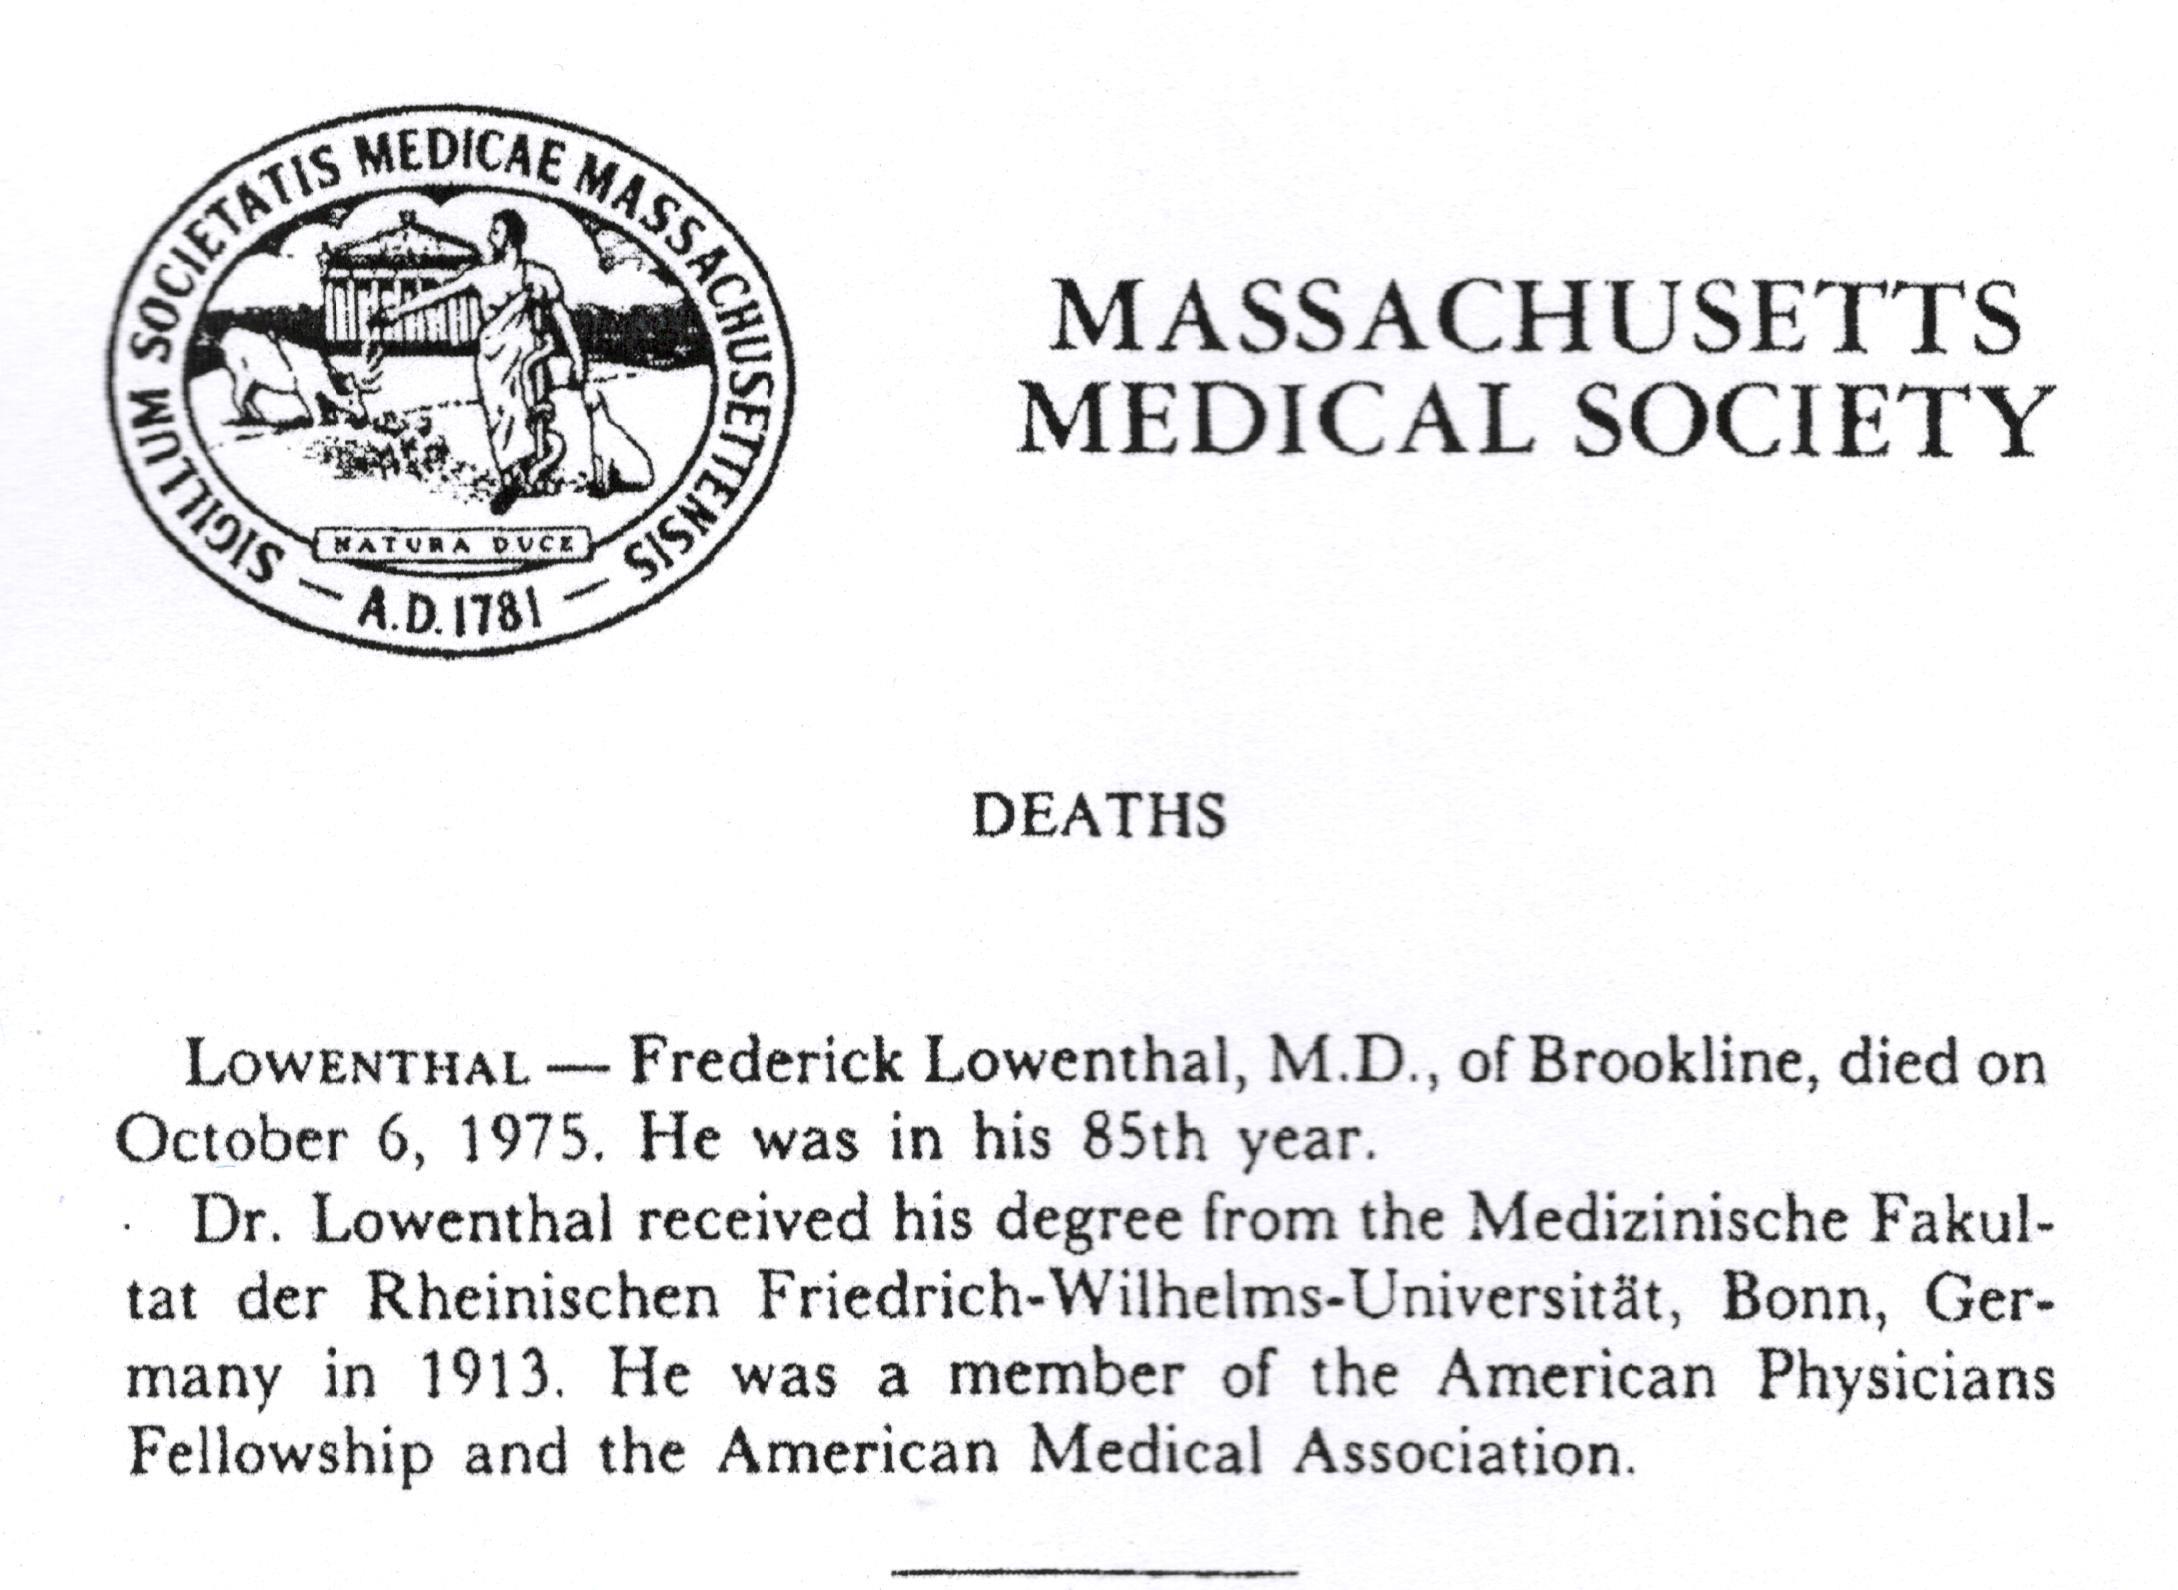 New England Journal of Medicine 1976